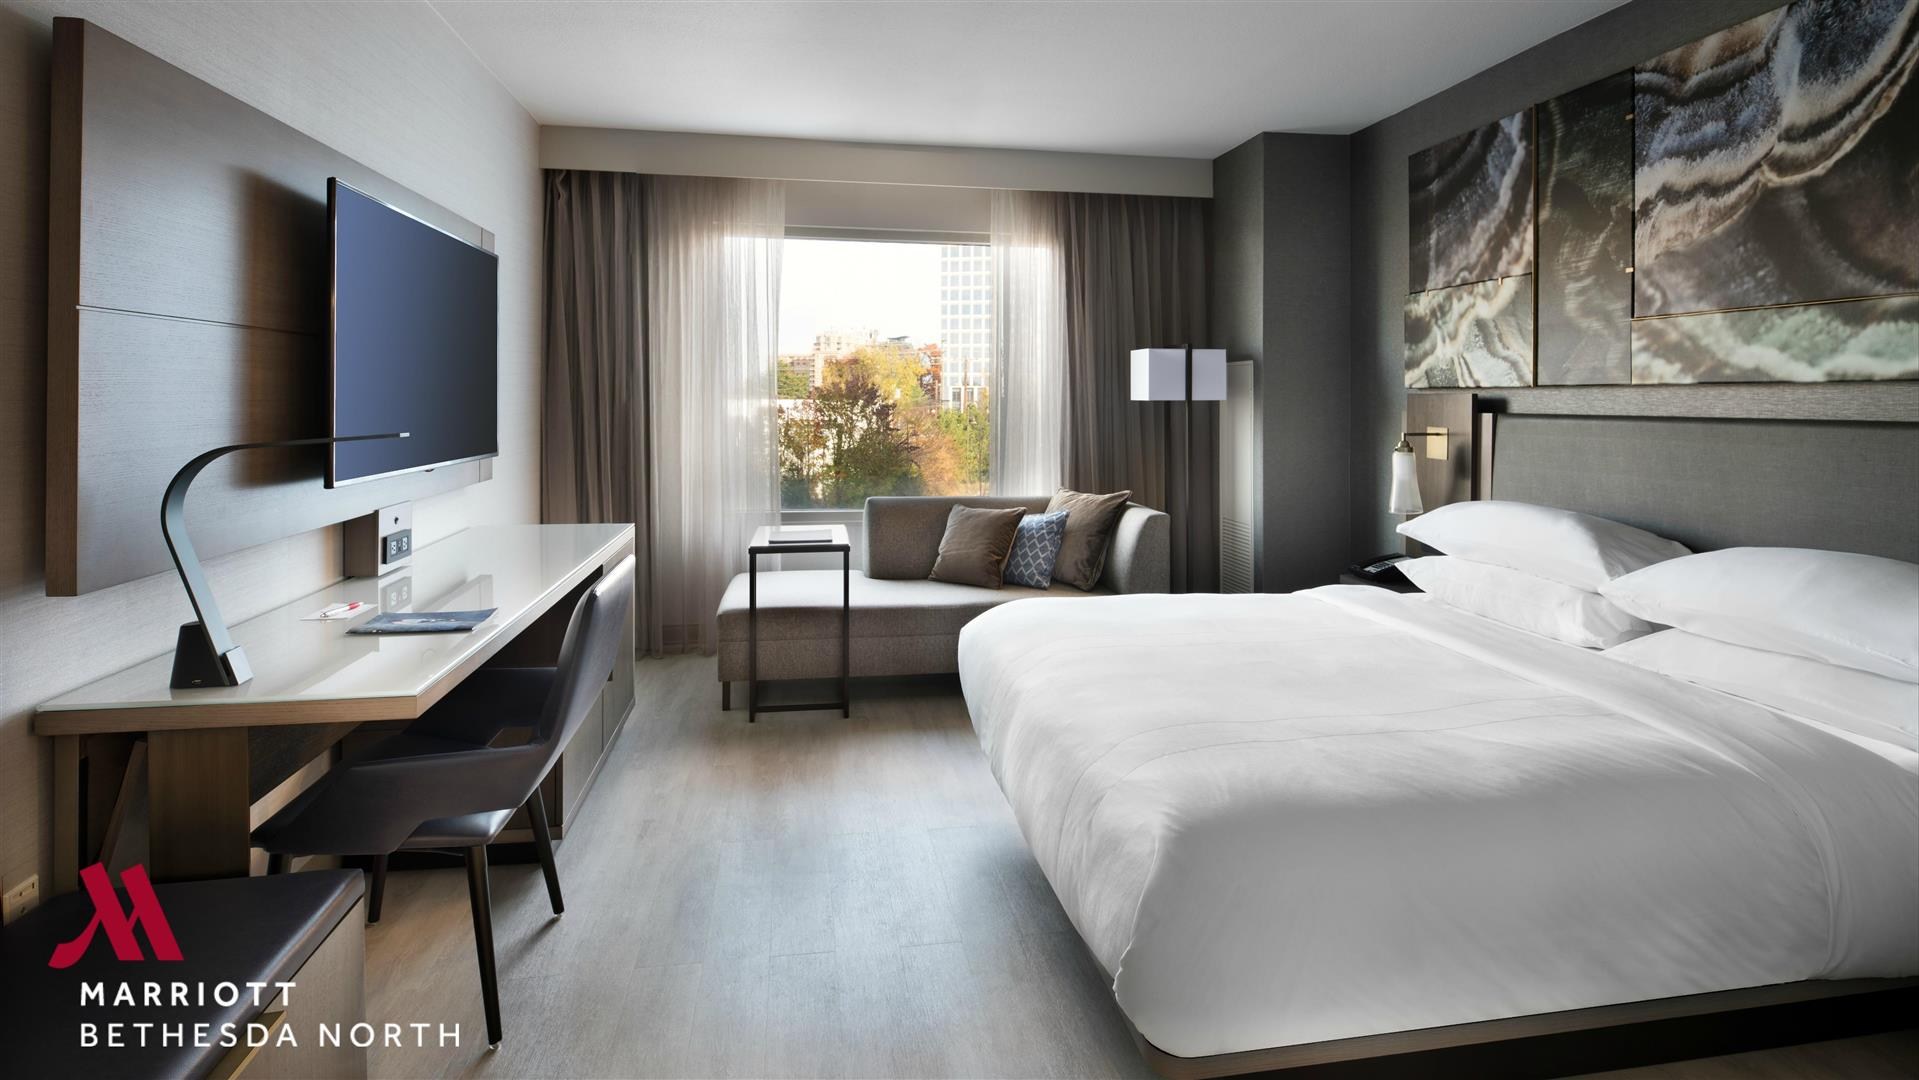 Admirable Meetings And Events At Bethesda North Marriott Hotel Best Image Libraries Weasiibadanjobscom